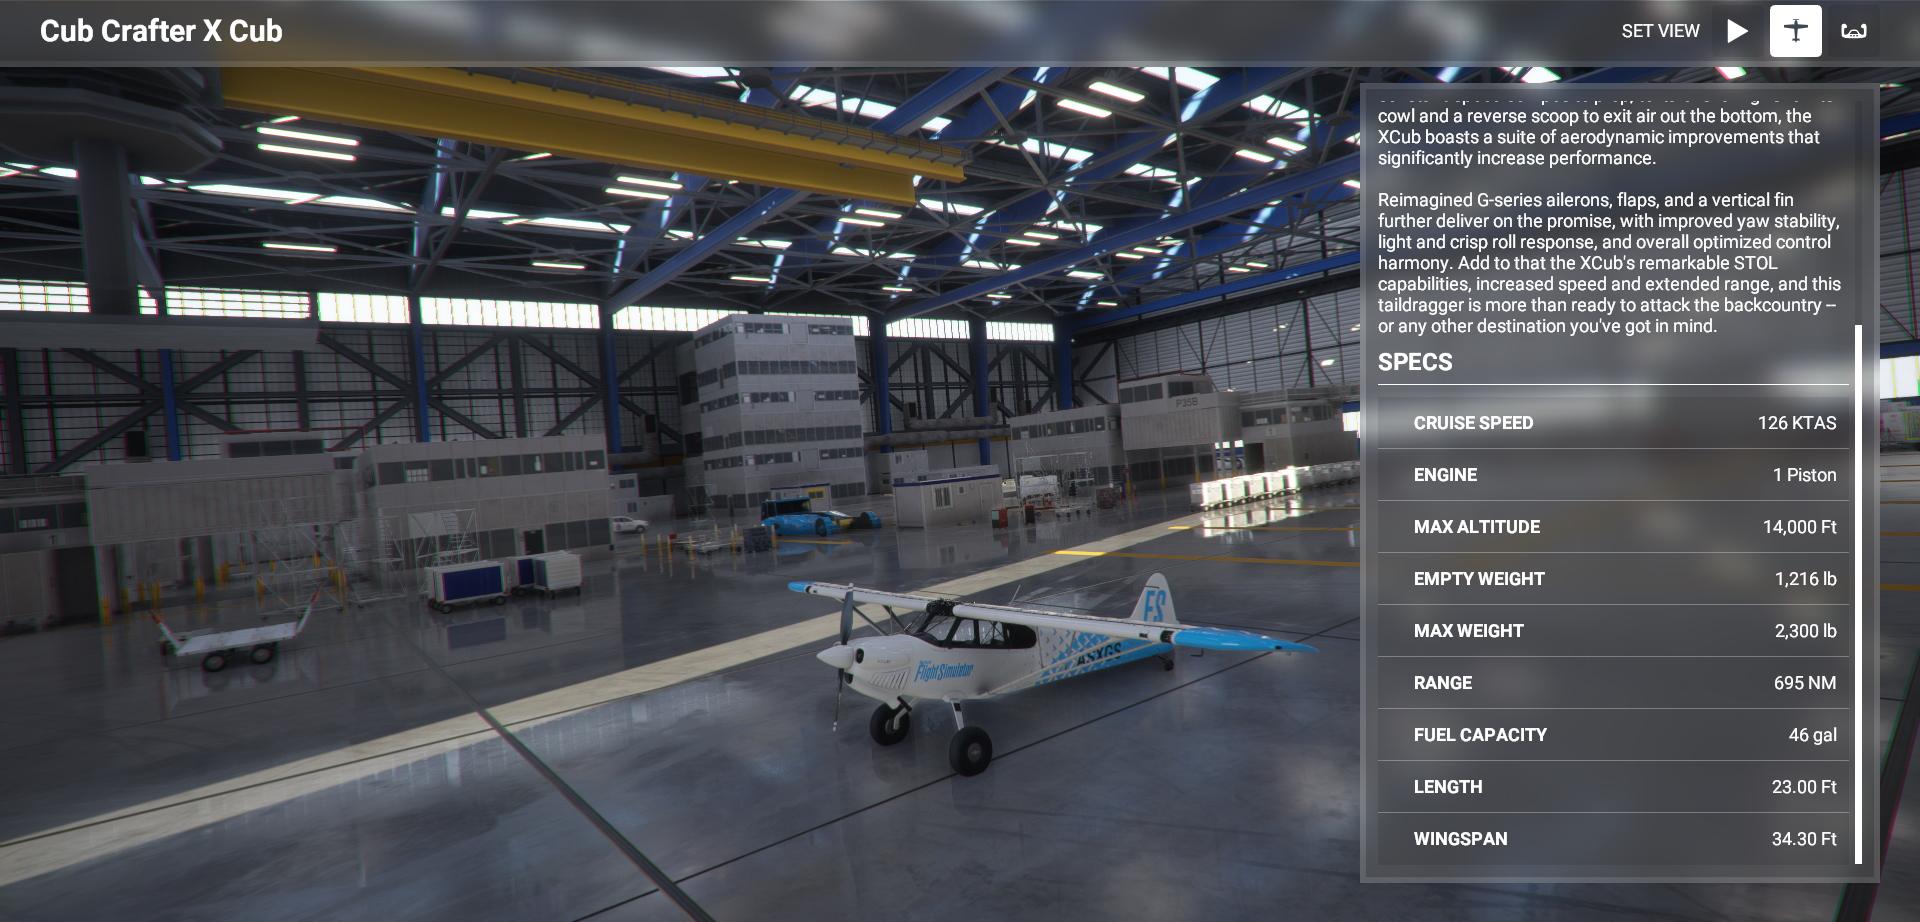 Microsoft Flight Simulator Cub Crafter X Cub